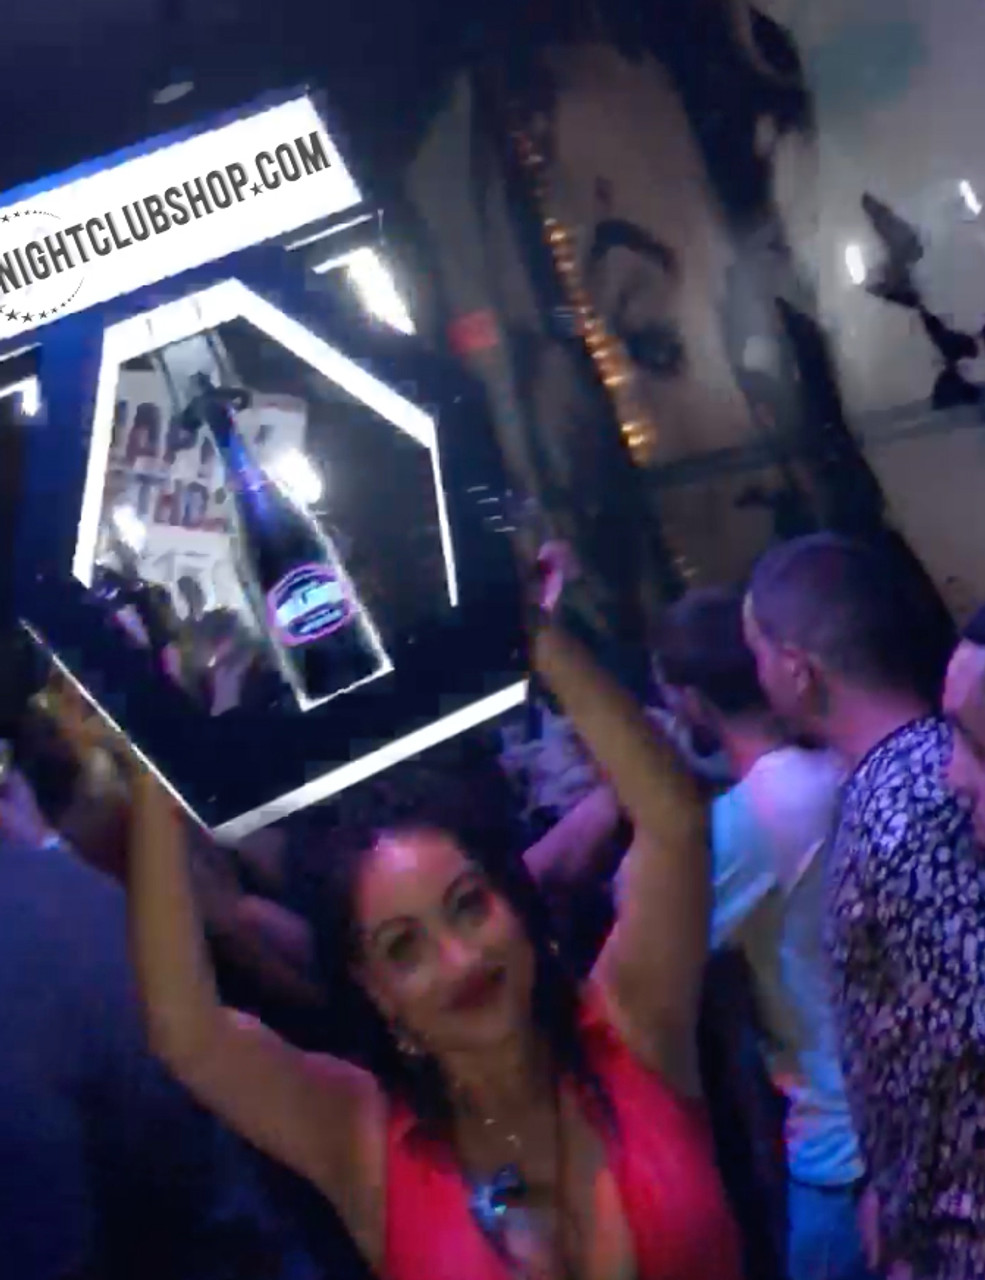 CAMEO_Nightclub_VIP_Lightbox_Champagne_Liquor_Tray_interchangeable_Bottle_service_carrier_holder_tray_Presenter_caddie_caddy_Banner_Top_Nightclubshop